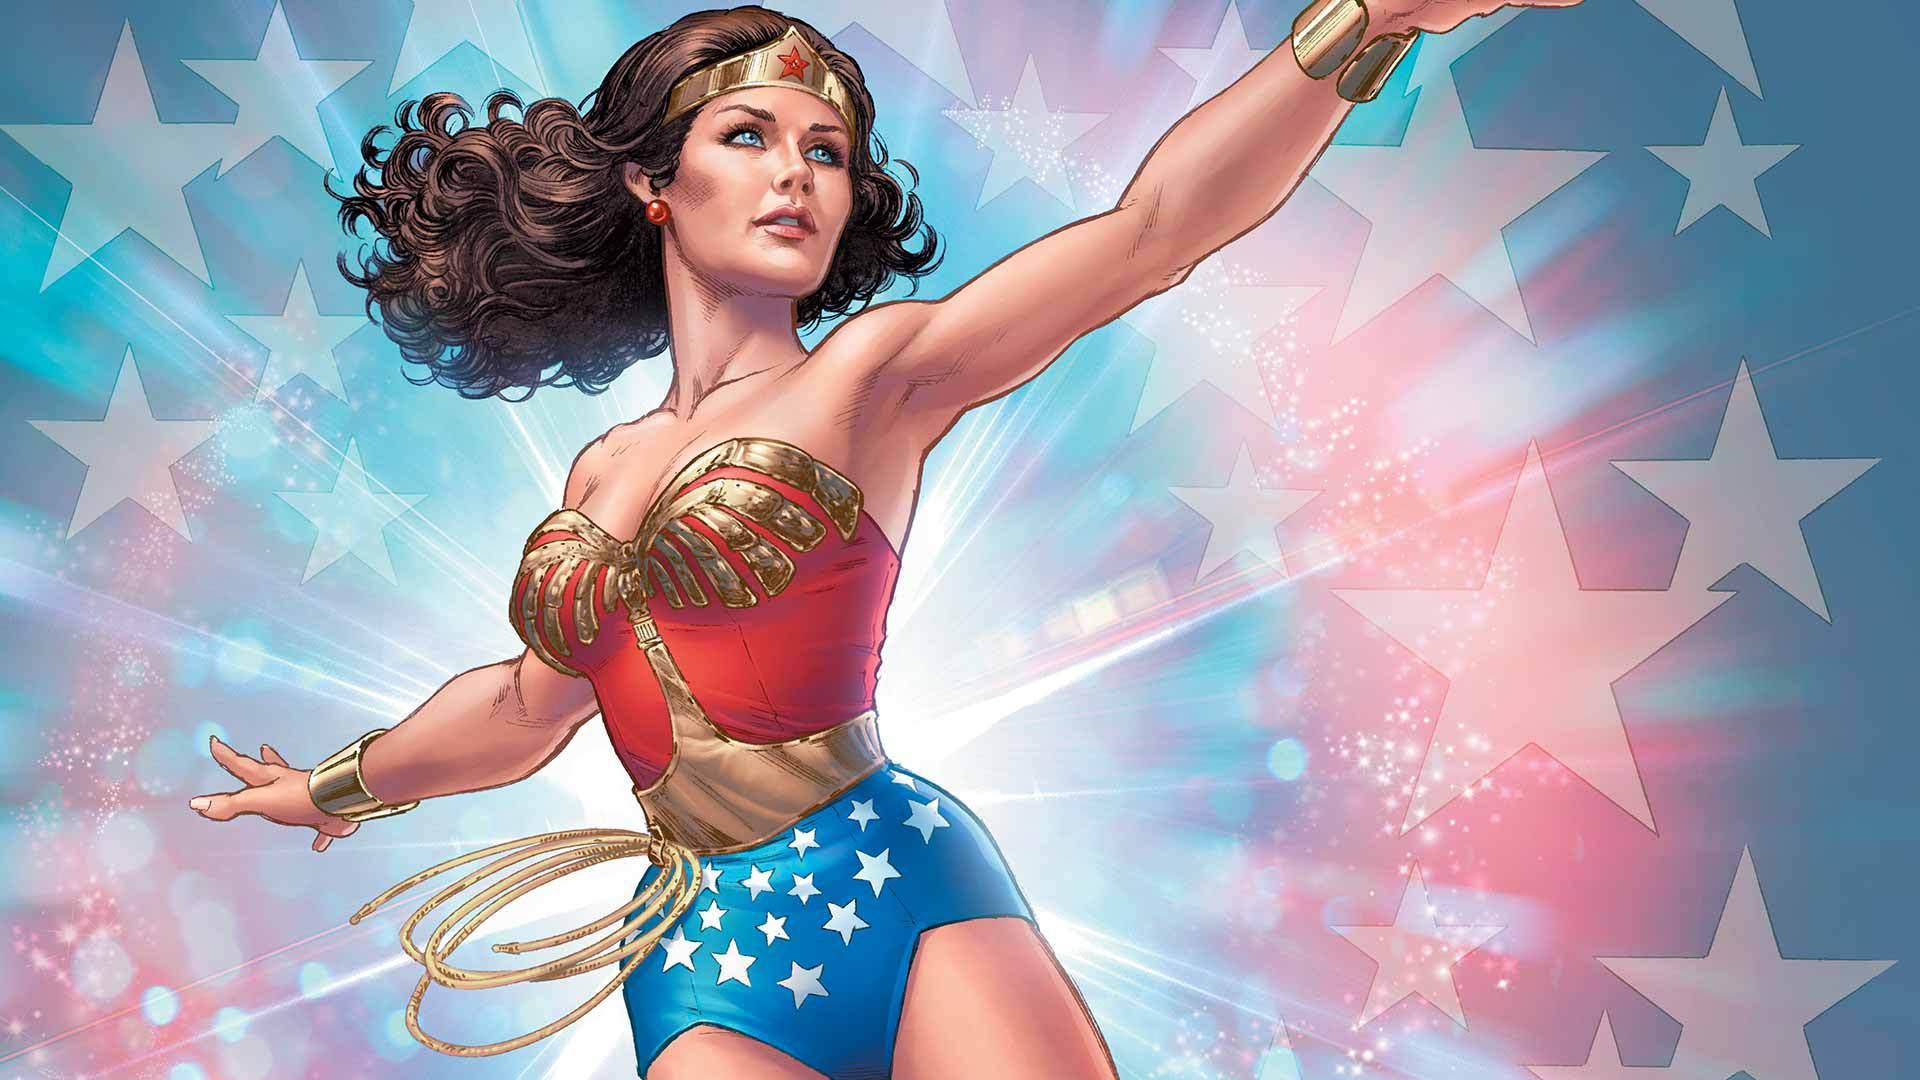 Wonder Woman Wallpapers Hd Free Download